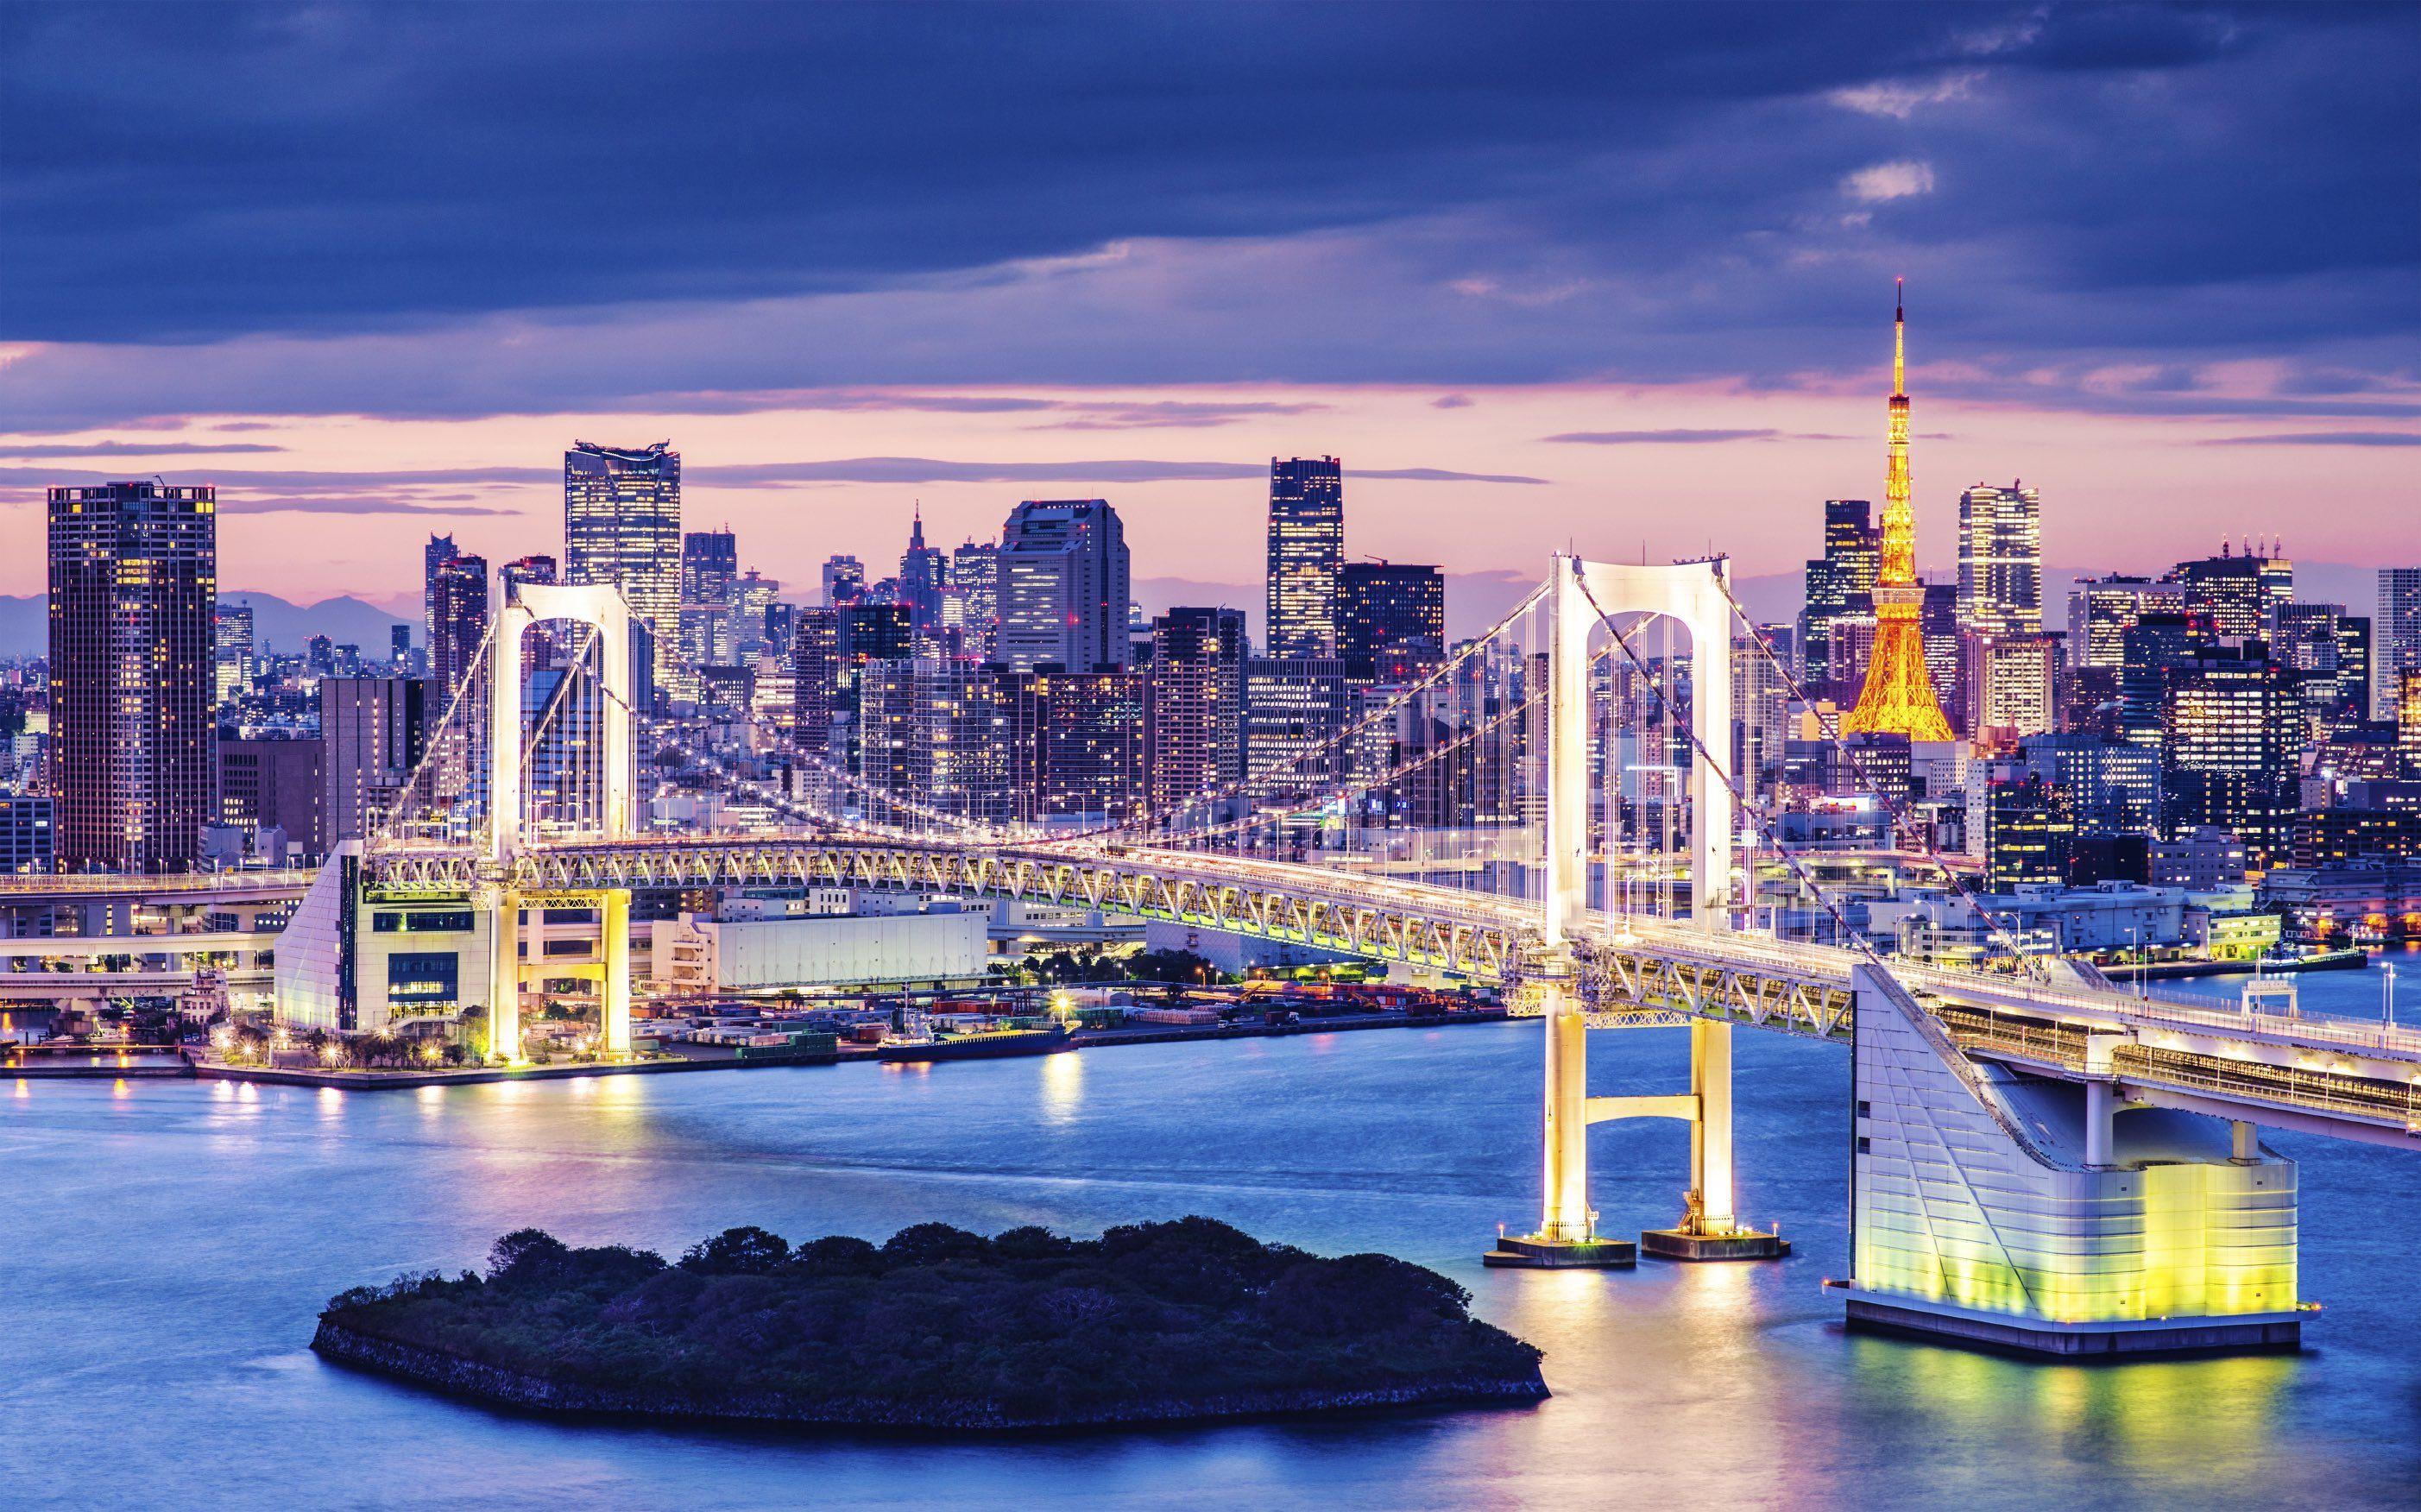 View of Rainbow Bridge and Minato from Odaiba in Tokyo Odaiba 2805x1752